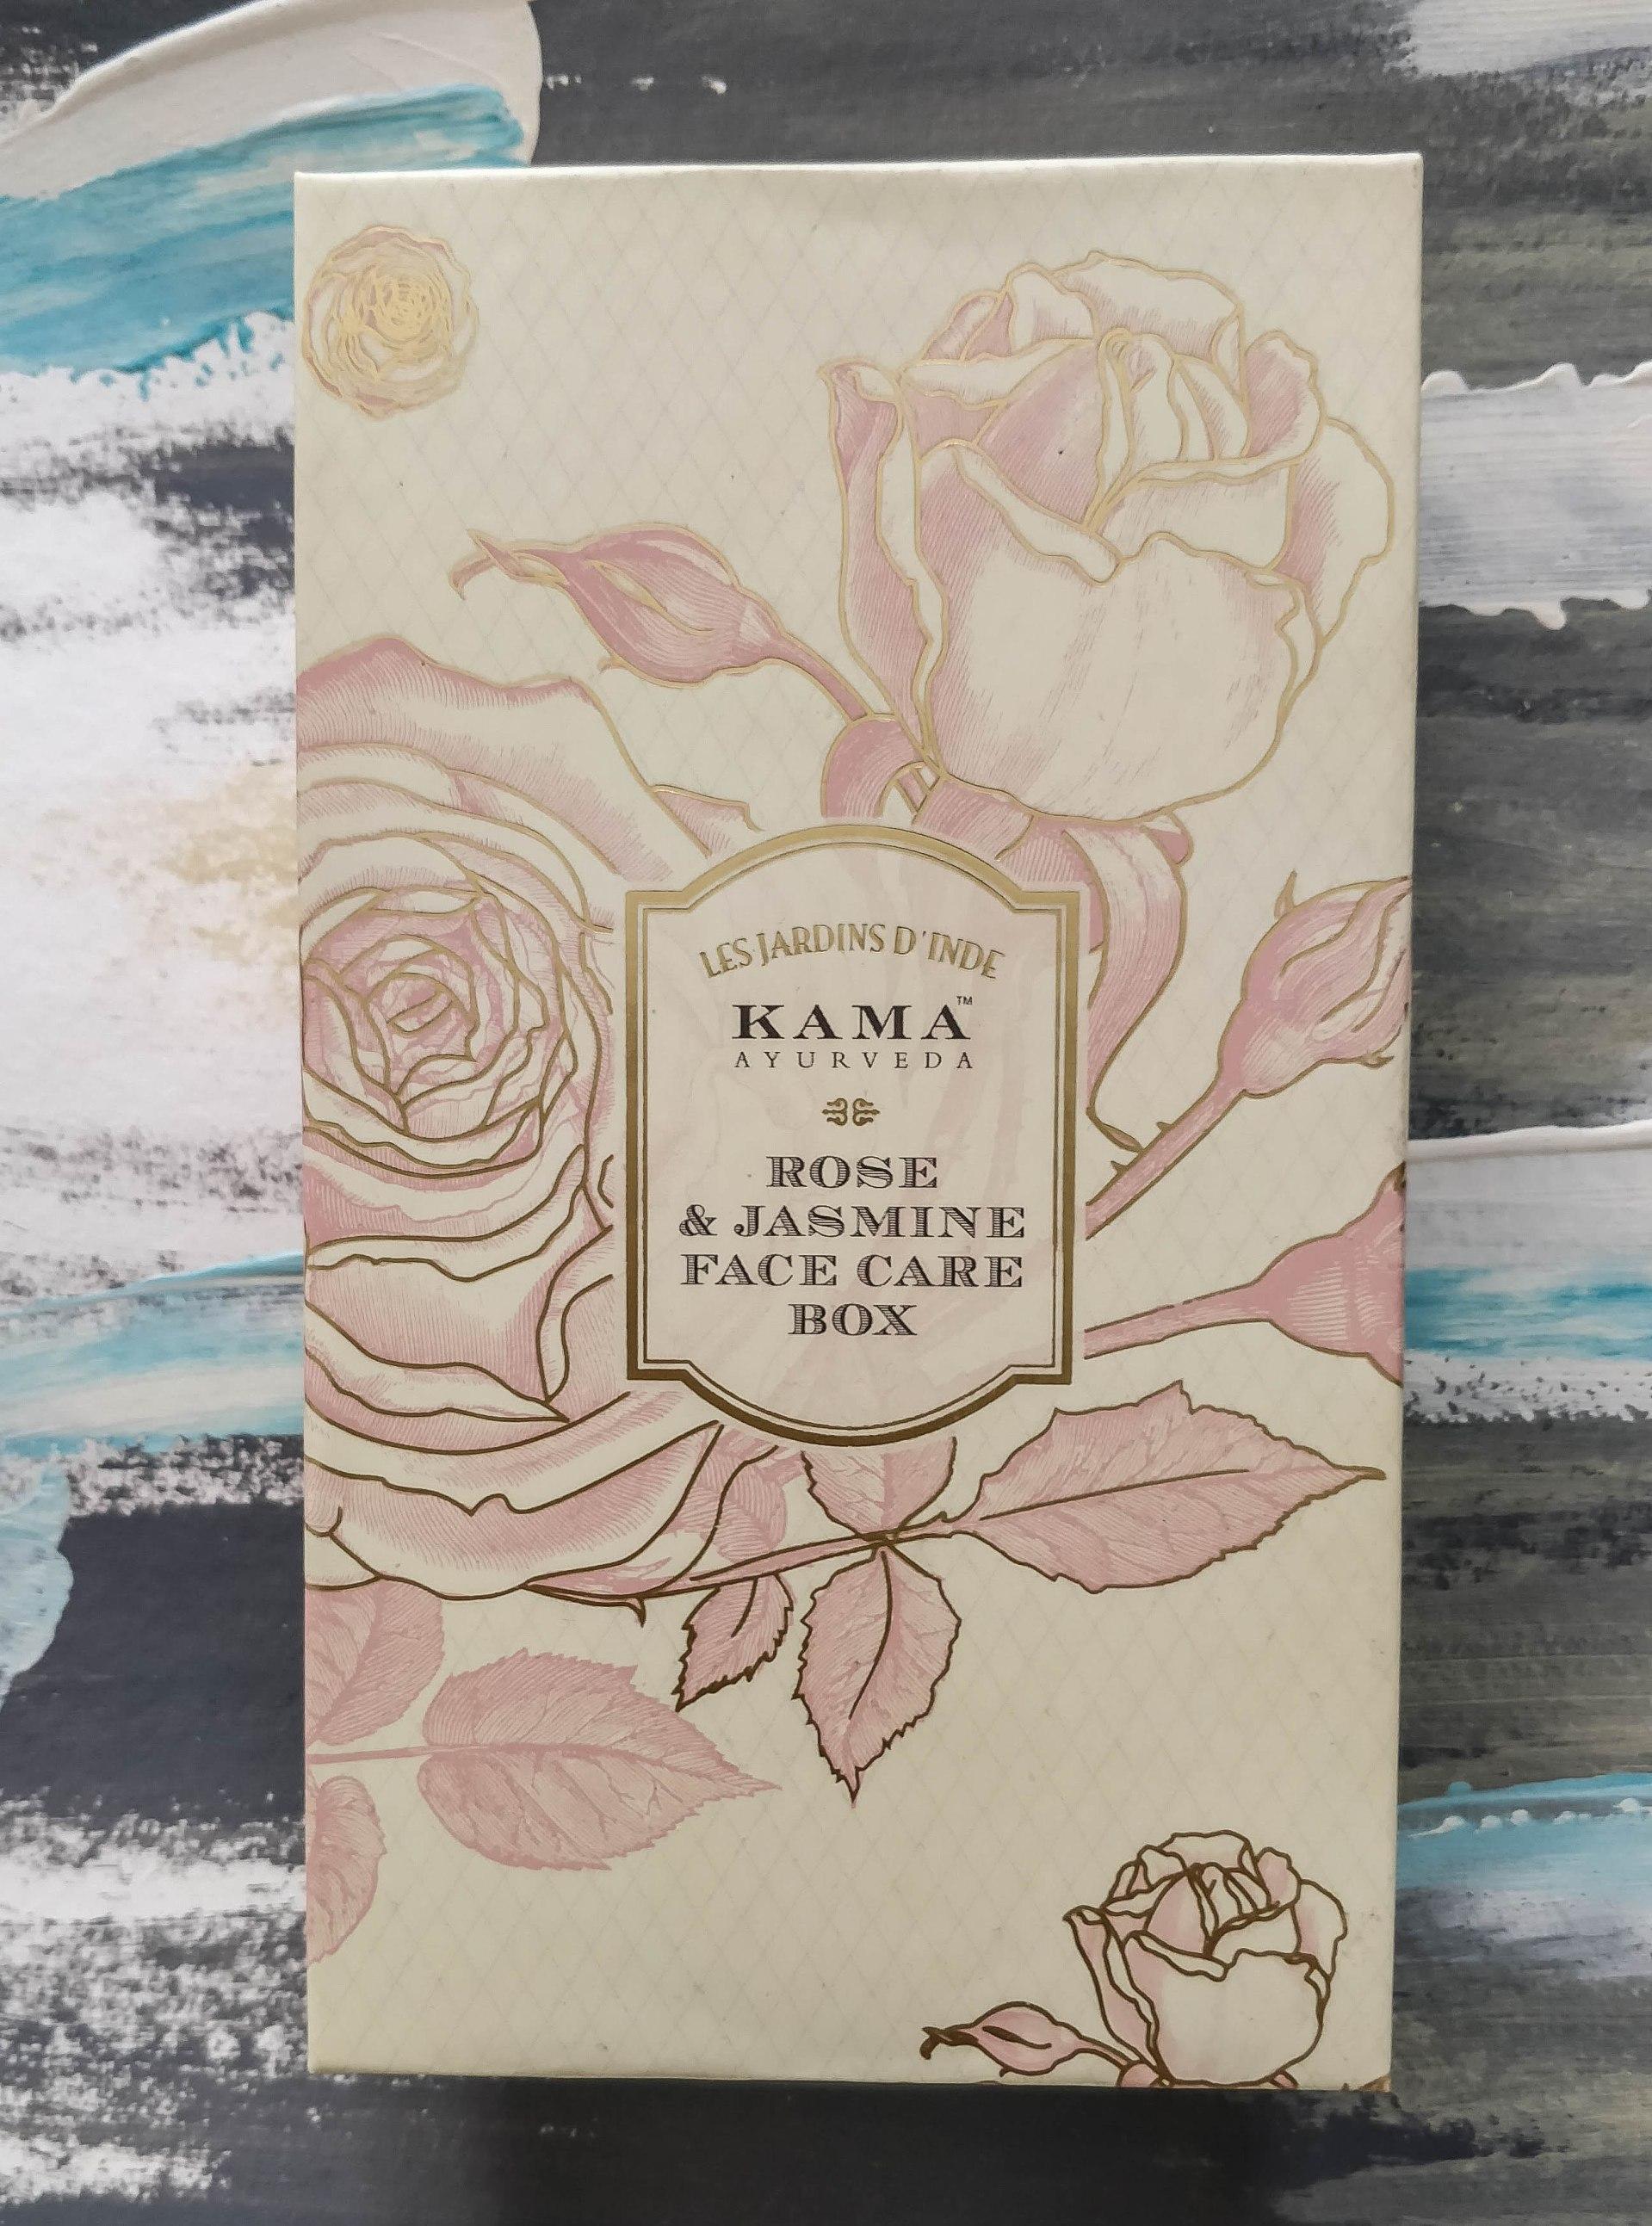 Kama Ayurveda Rose & Jasmine Face Box